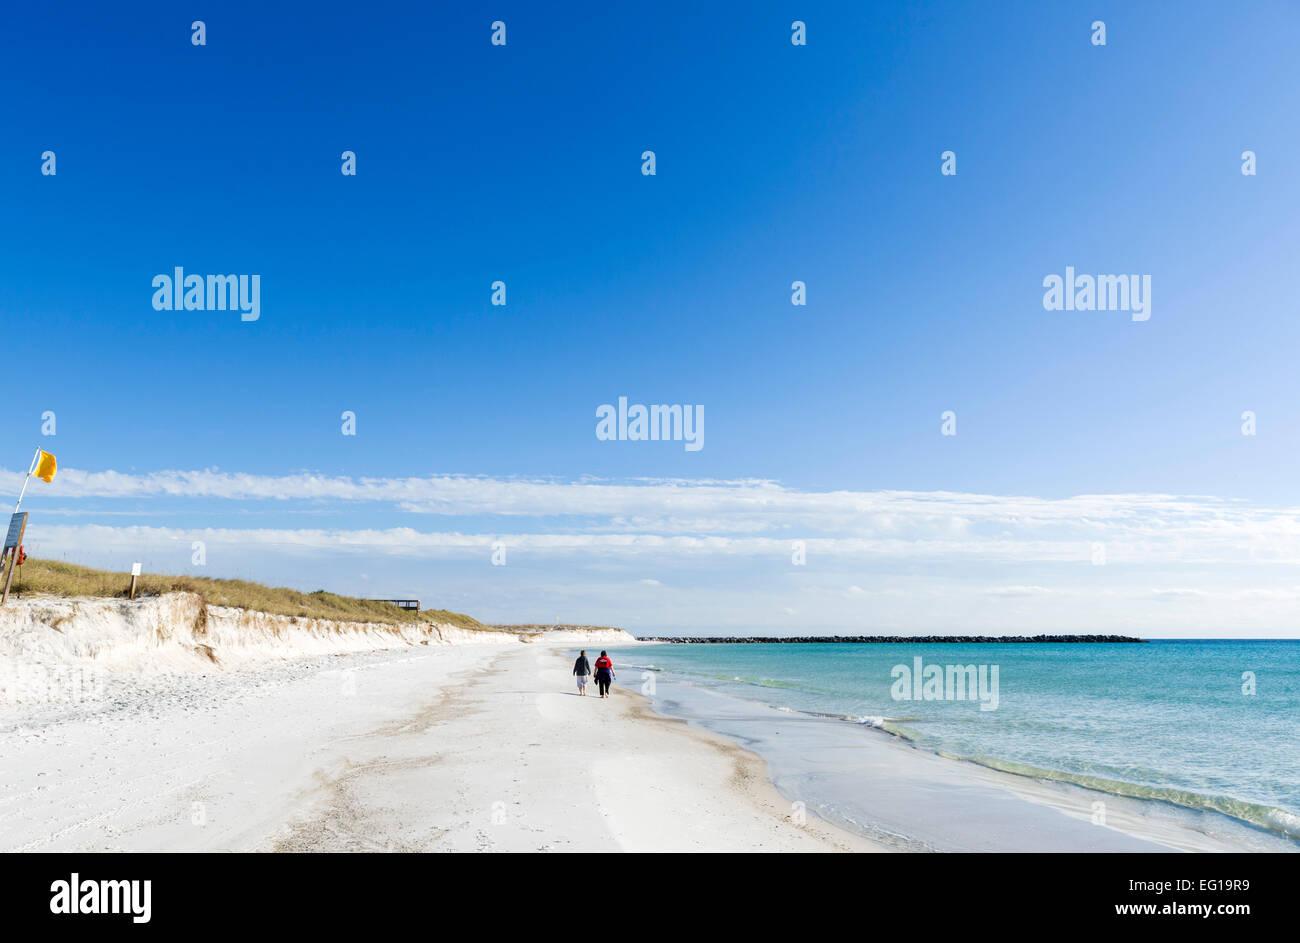 The Beach at St Andrews State Park, Panama City Beach, Florida, USA - Stock Image